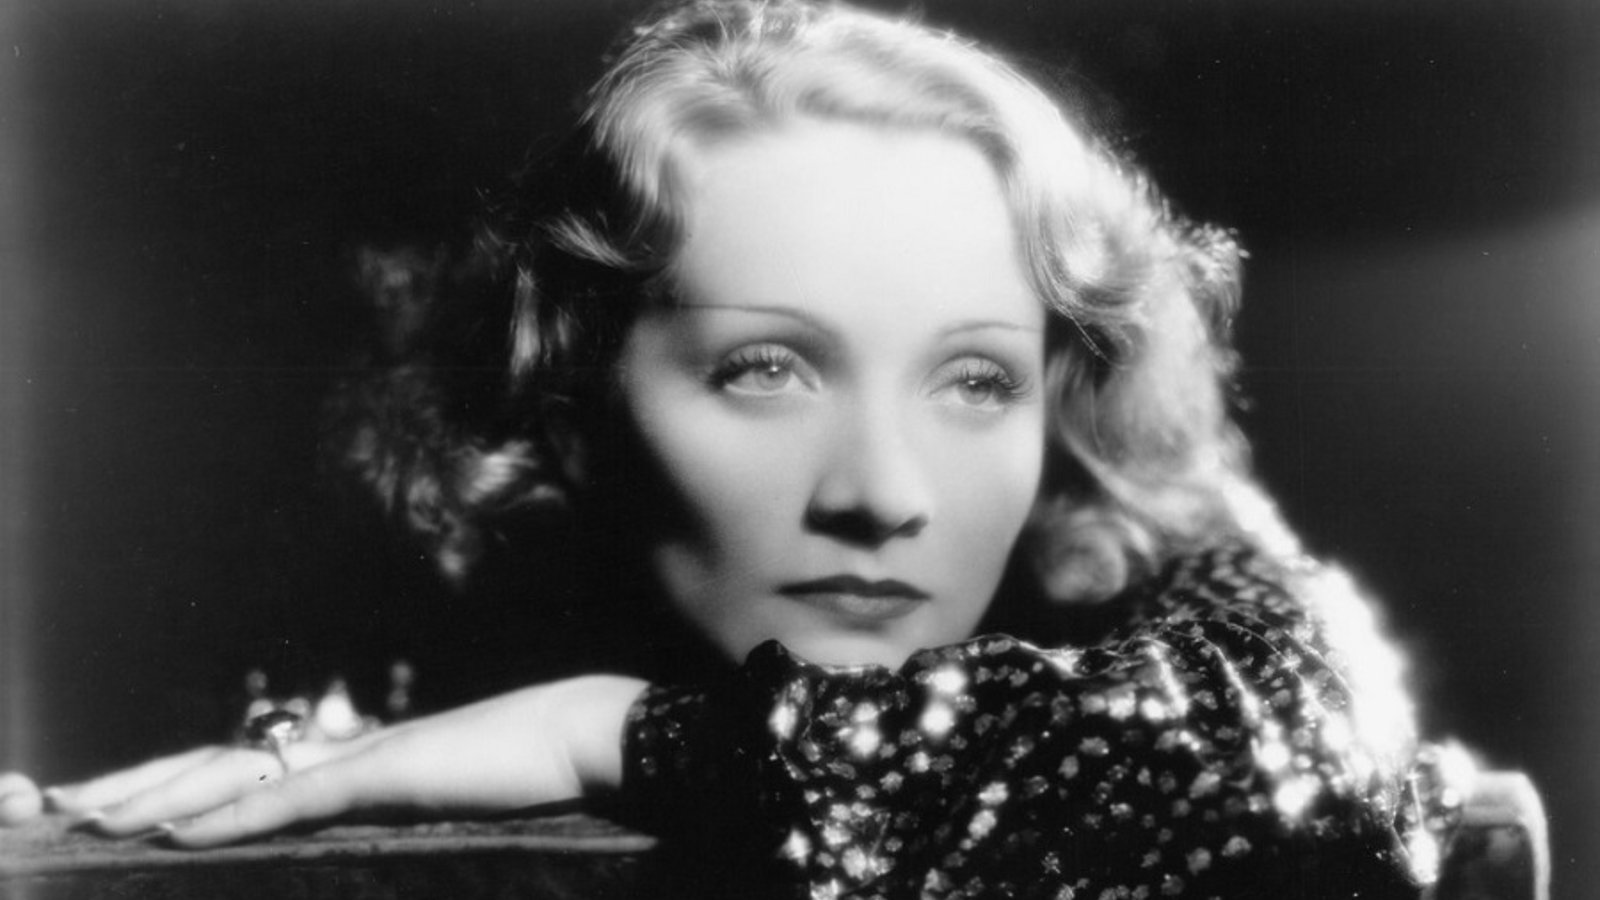 Marlene - The Life of Legendary Actress Marlene Dietrich